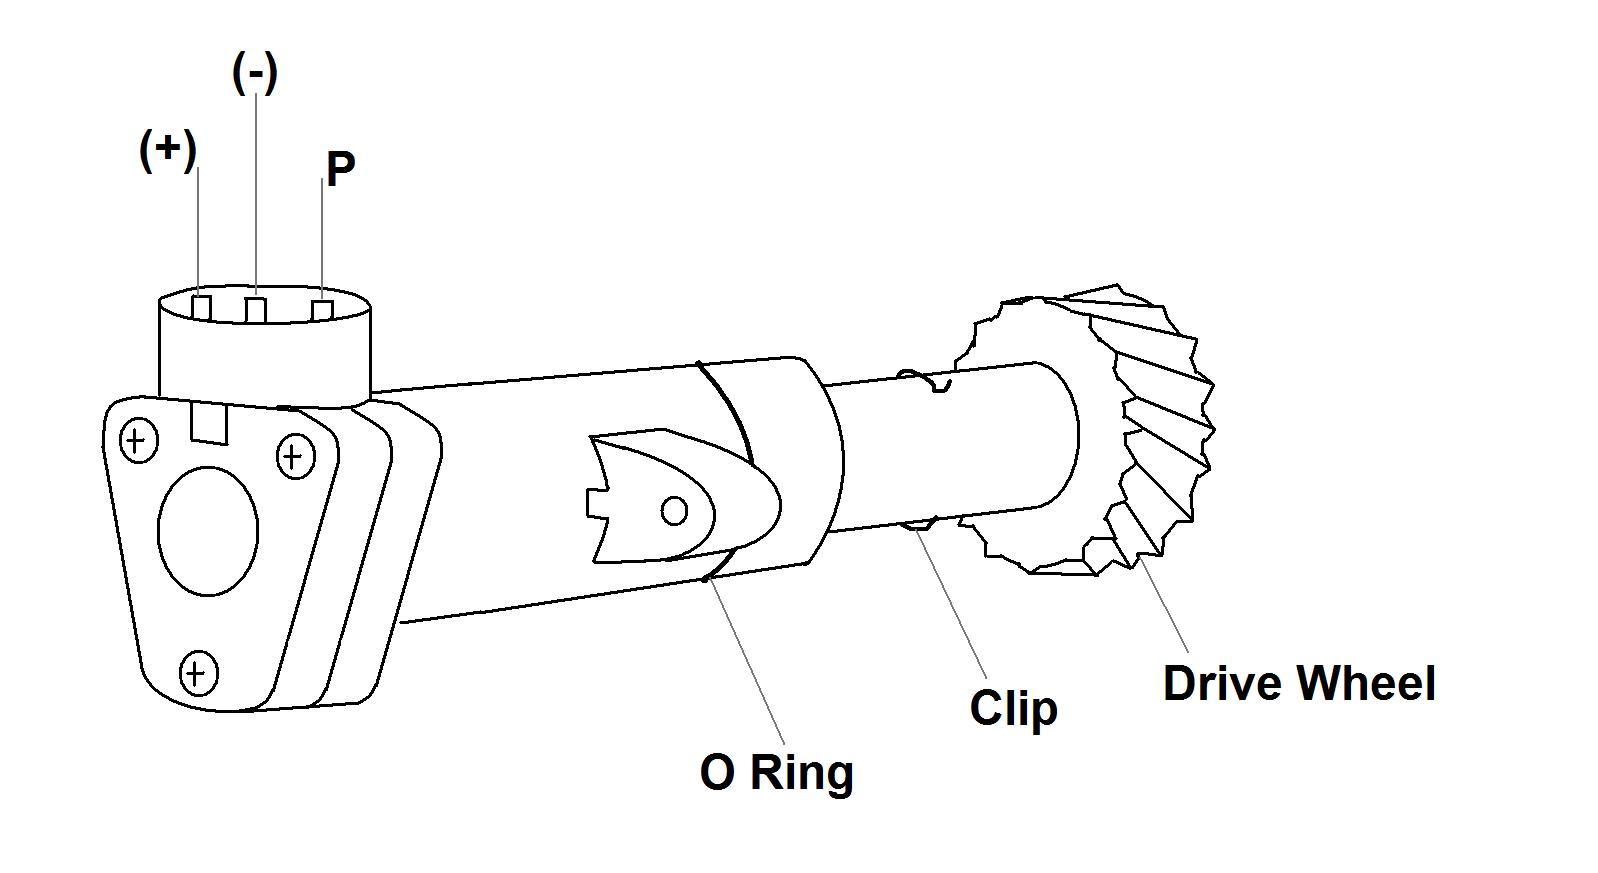 toyota g52 gearbox vehicle speed sensor wiring rh toyota g52speedsensor blogspot com 92 toyota pickup speed sensor wiring diagram toyota speed sensor wiring diagram